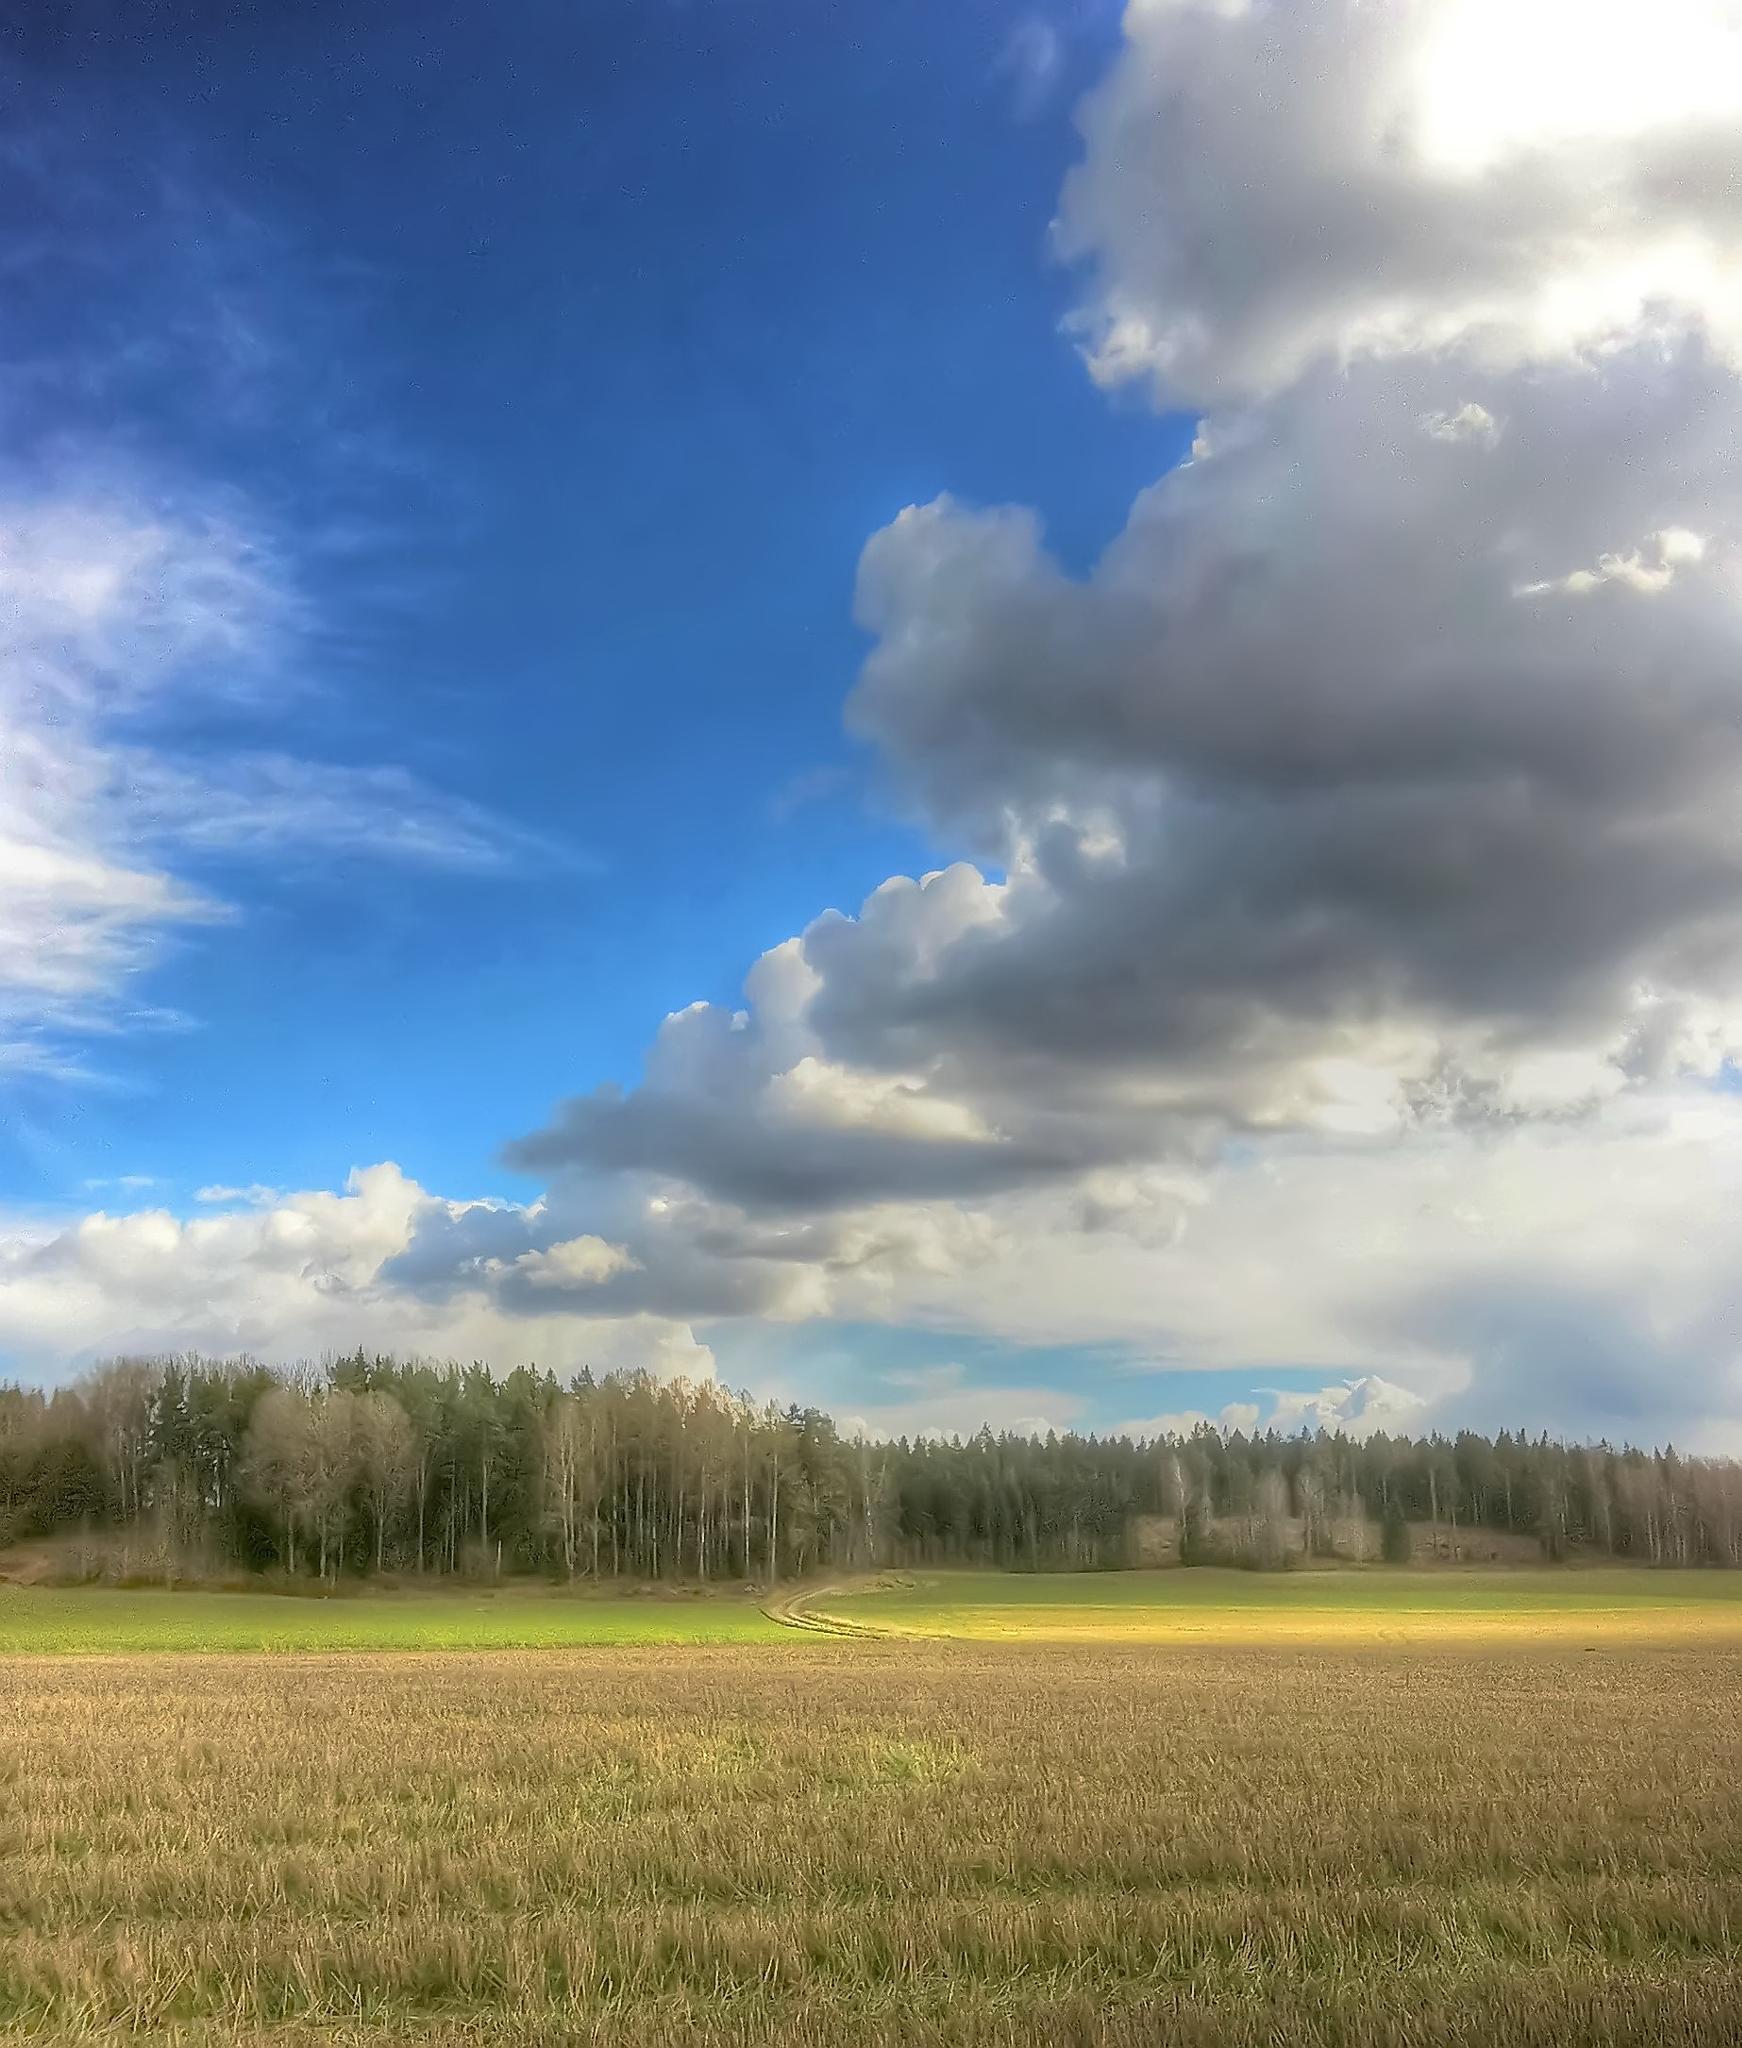 Strange Clouds pt2 by iPhonemania